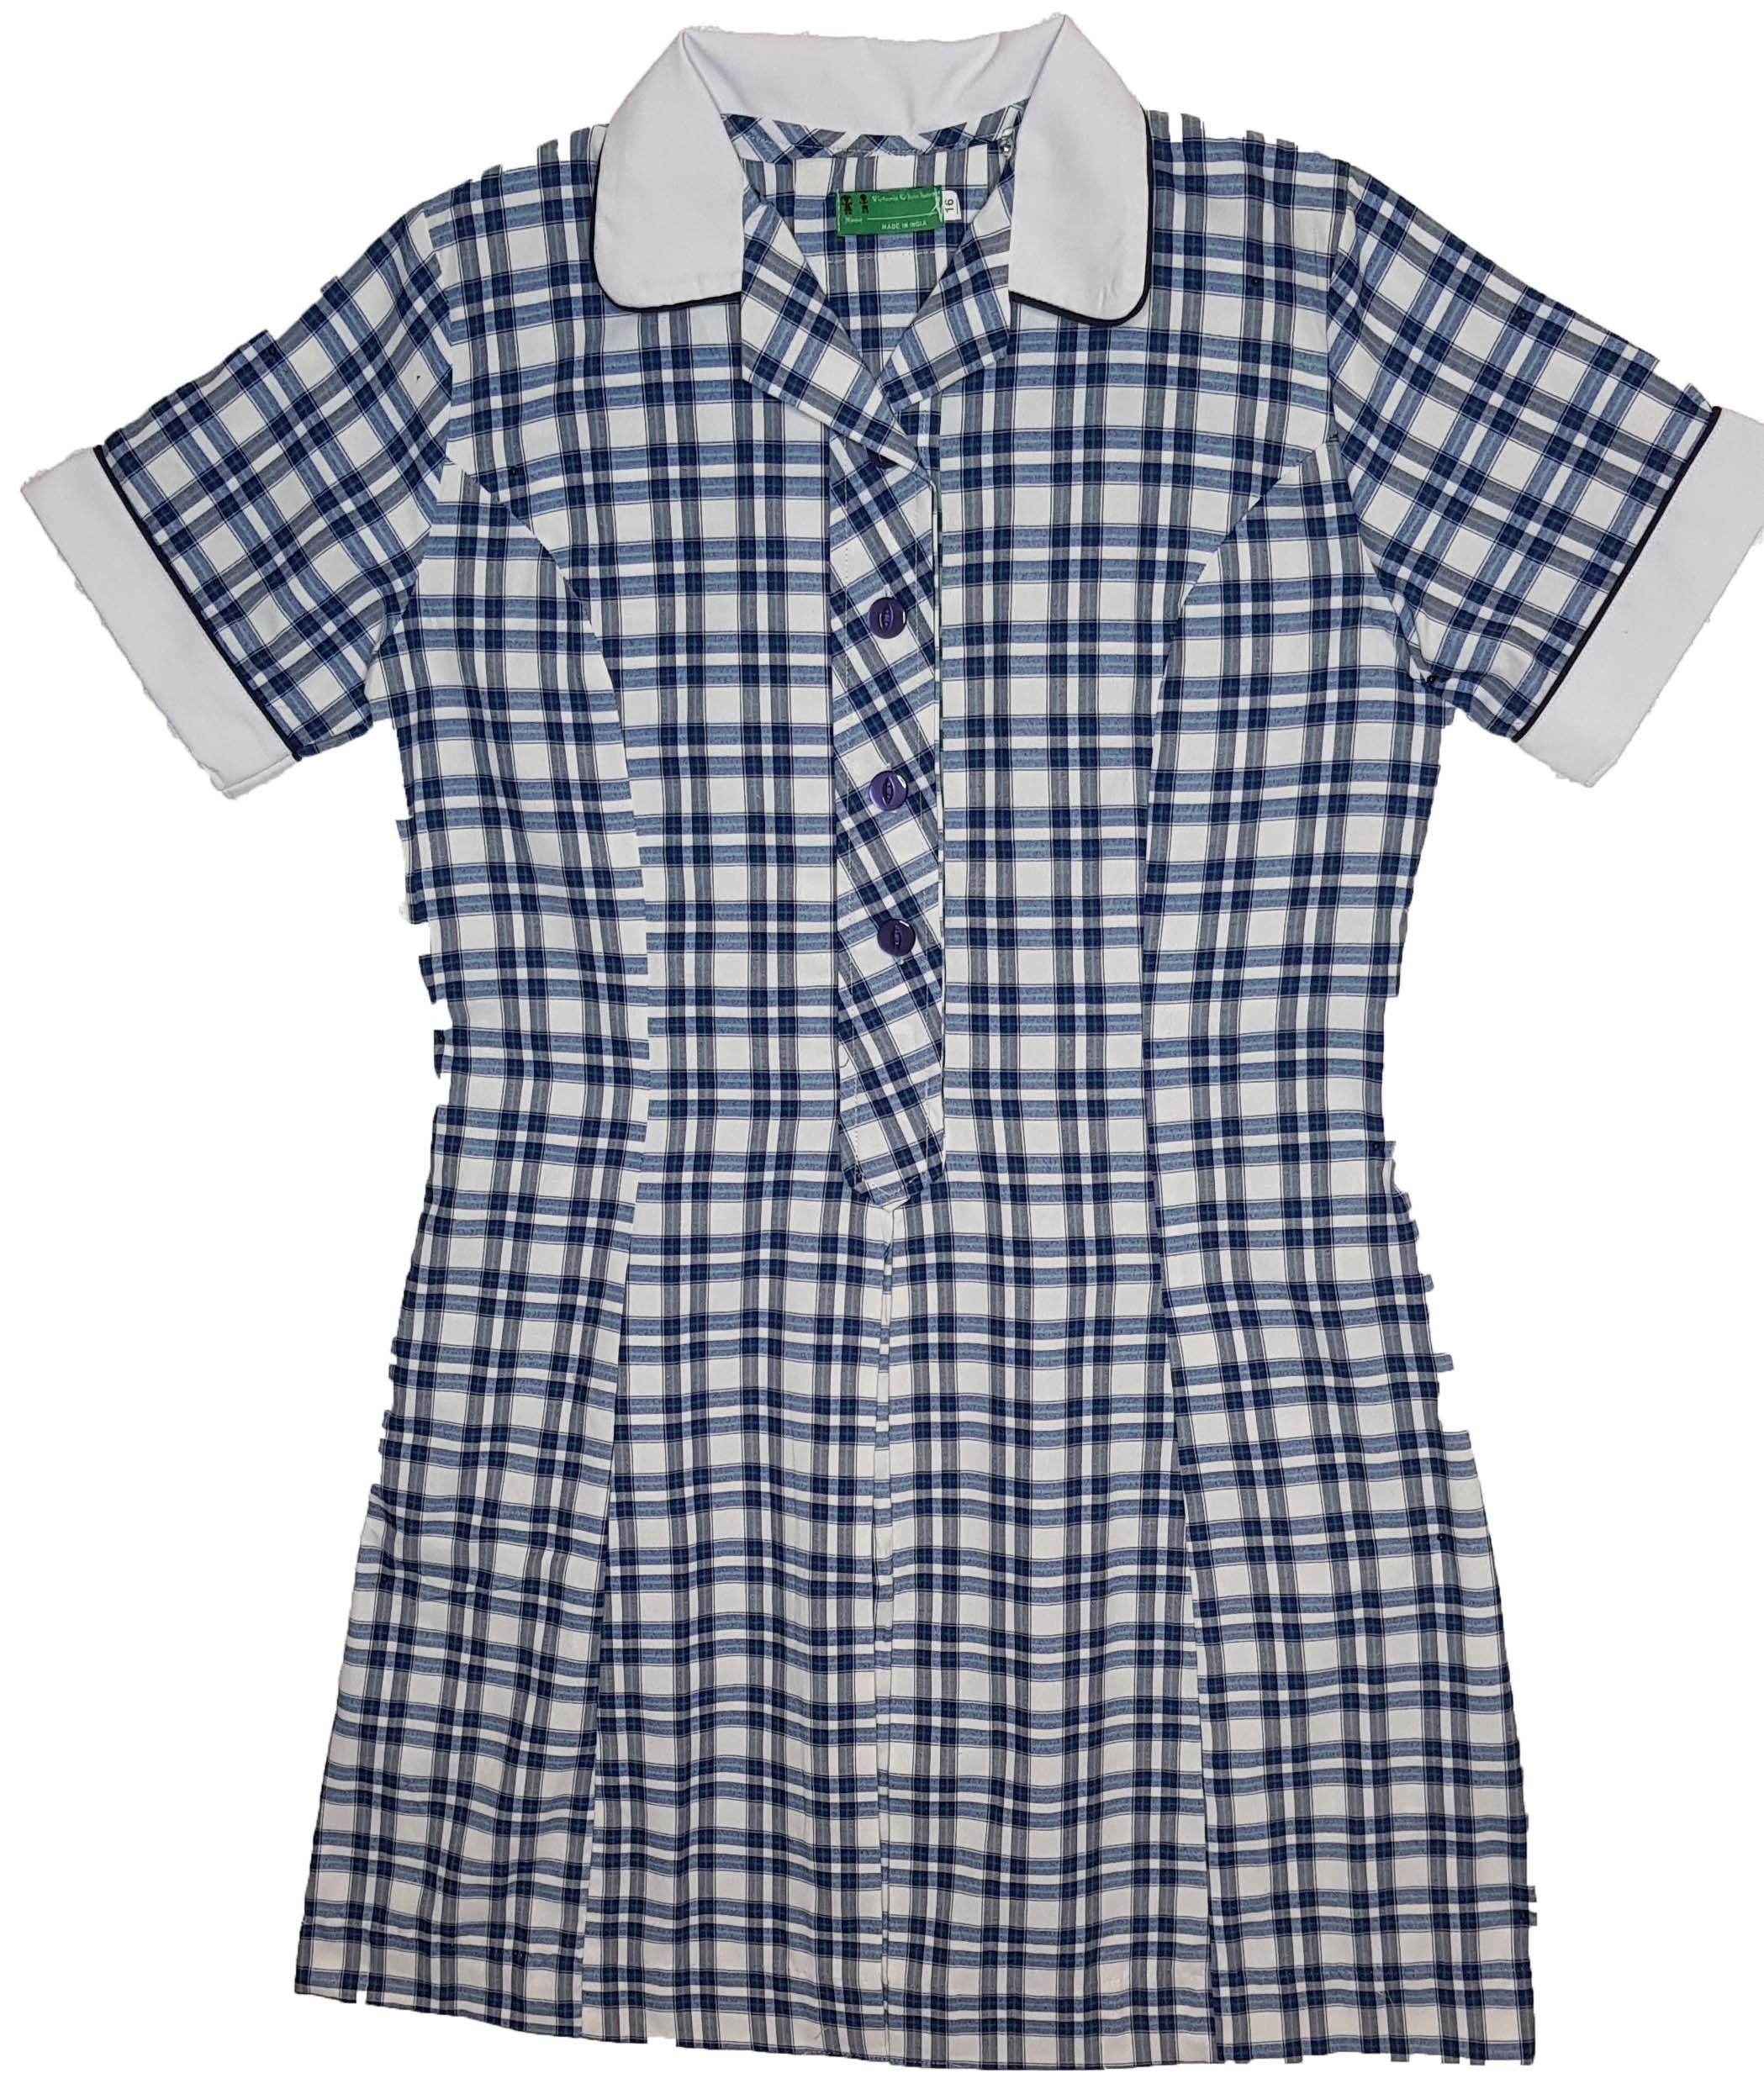 Dress | Skirt | Navy Pants